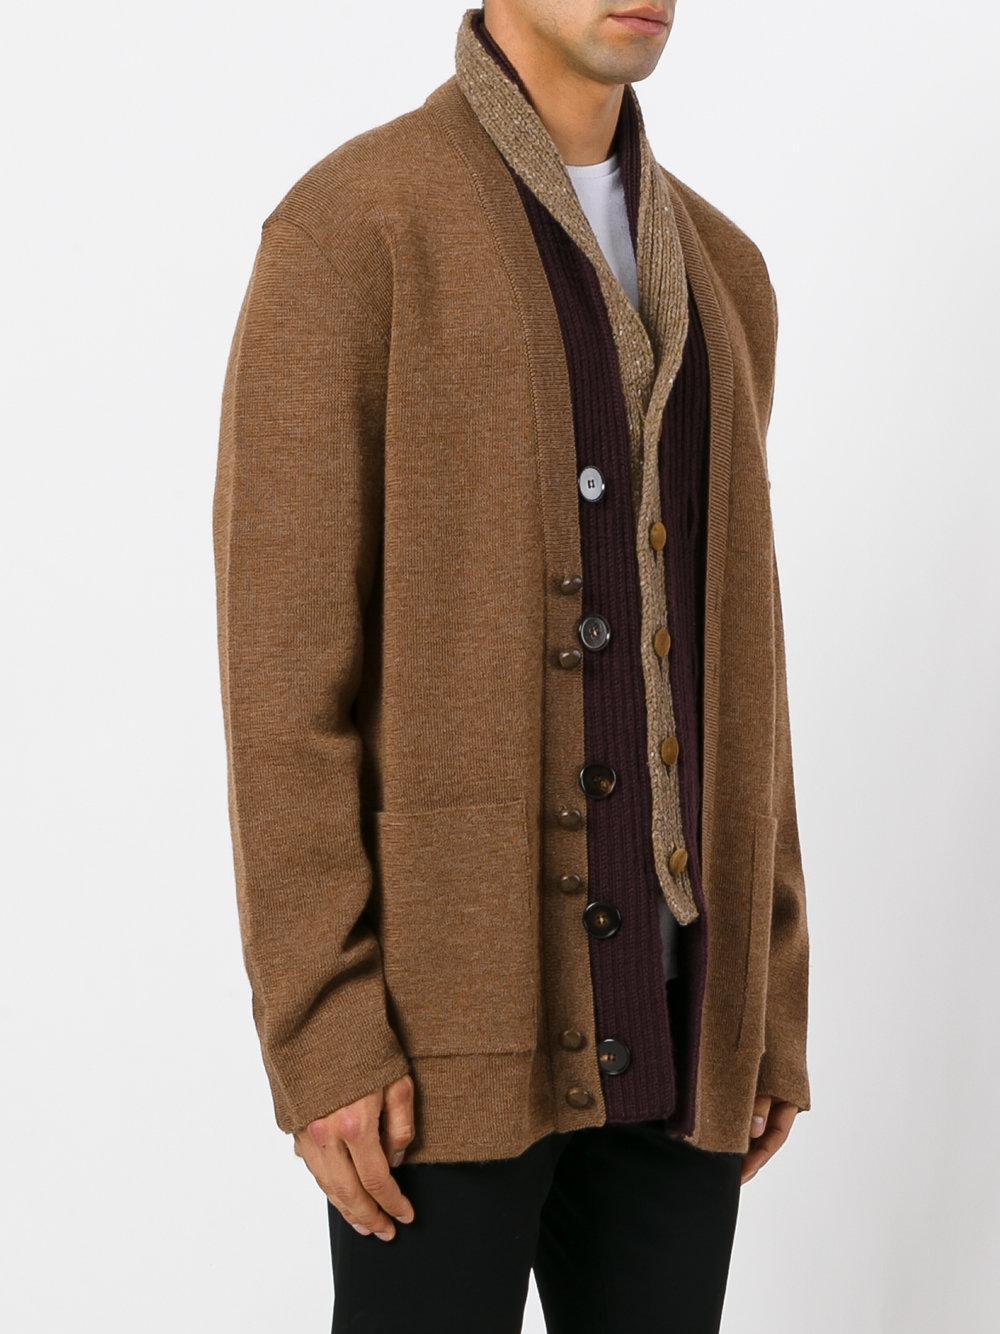 Maison margiela Shawl Collar Cardigan in Brown for Men